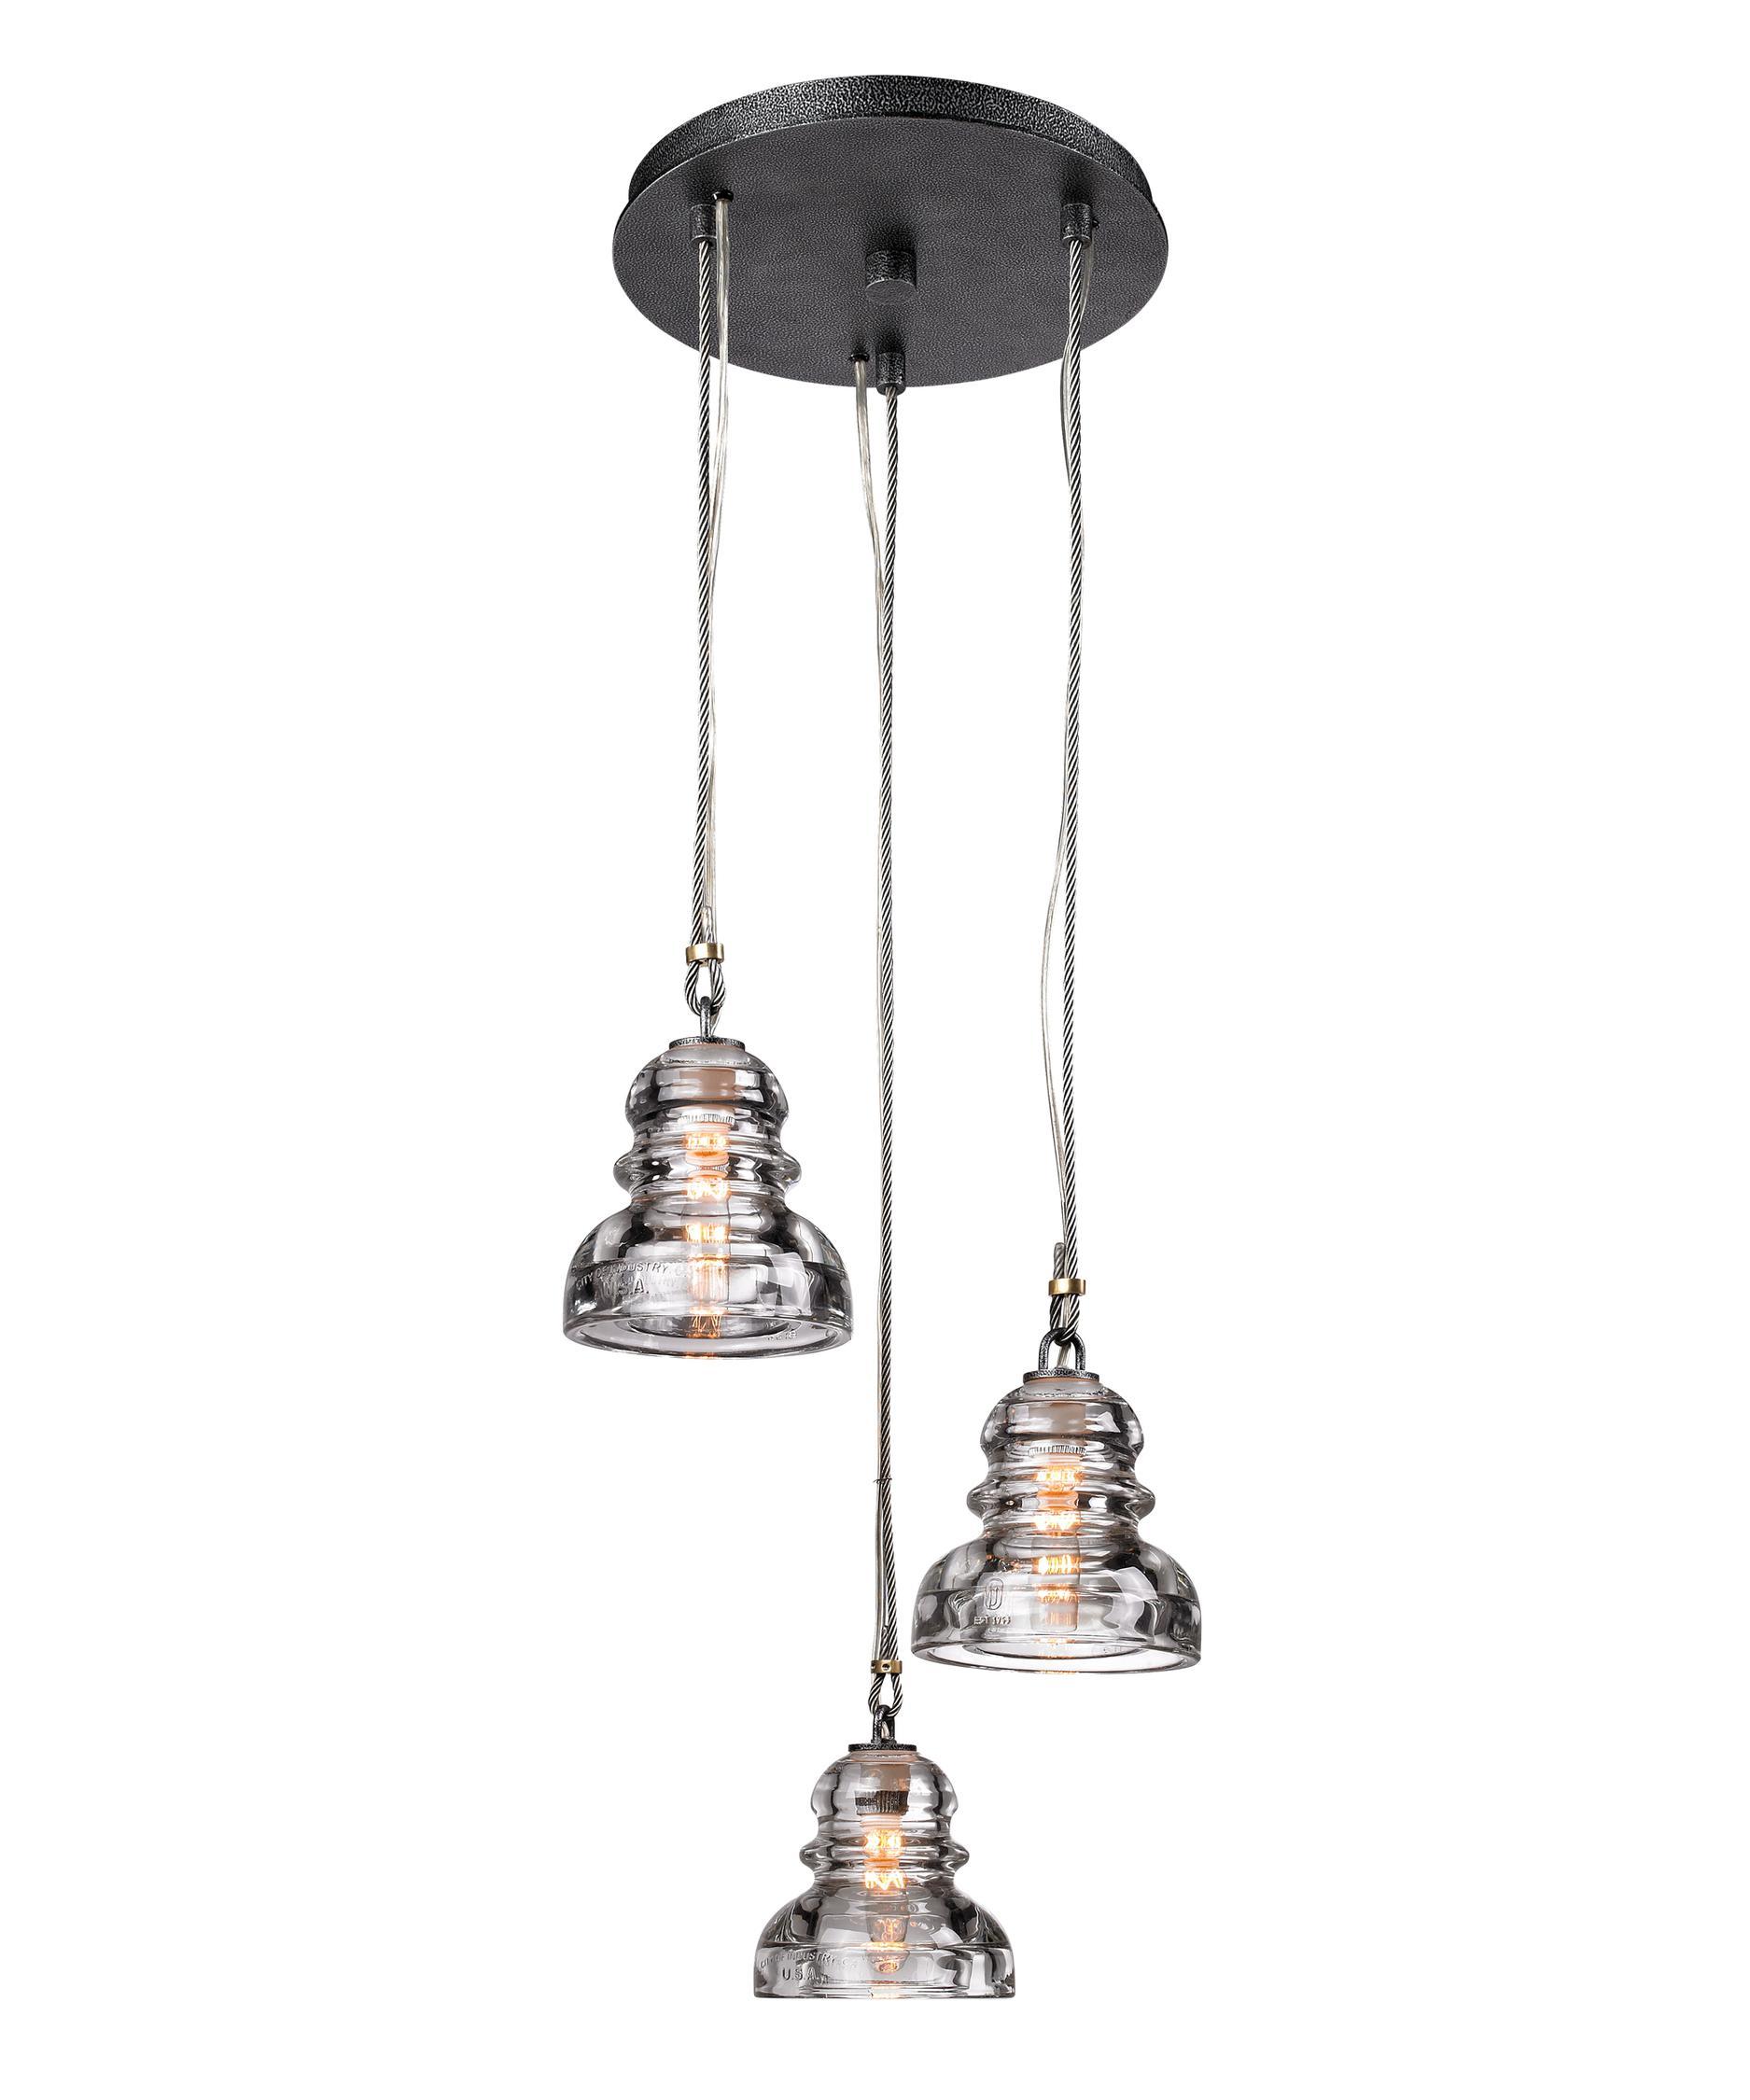 troy lighting f3133 menlo park 14 inch mini pendant capitol lighting. Black Bedroom Furniture Sets. Home Design Ideas